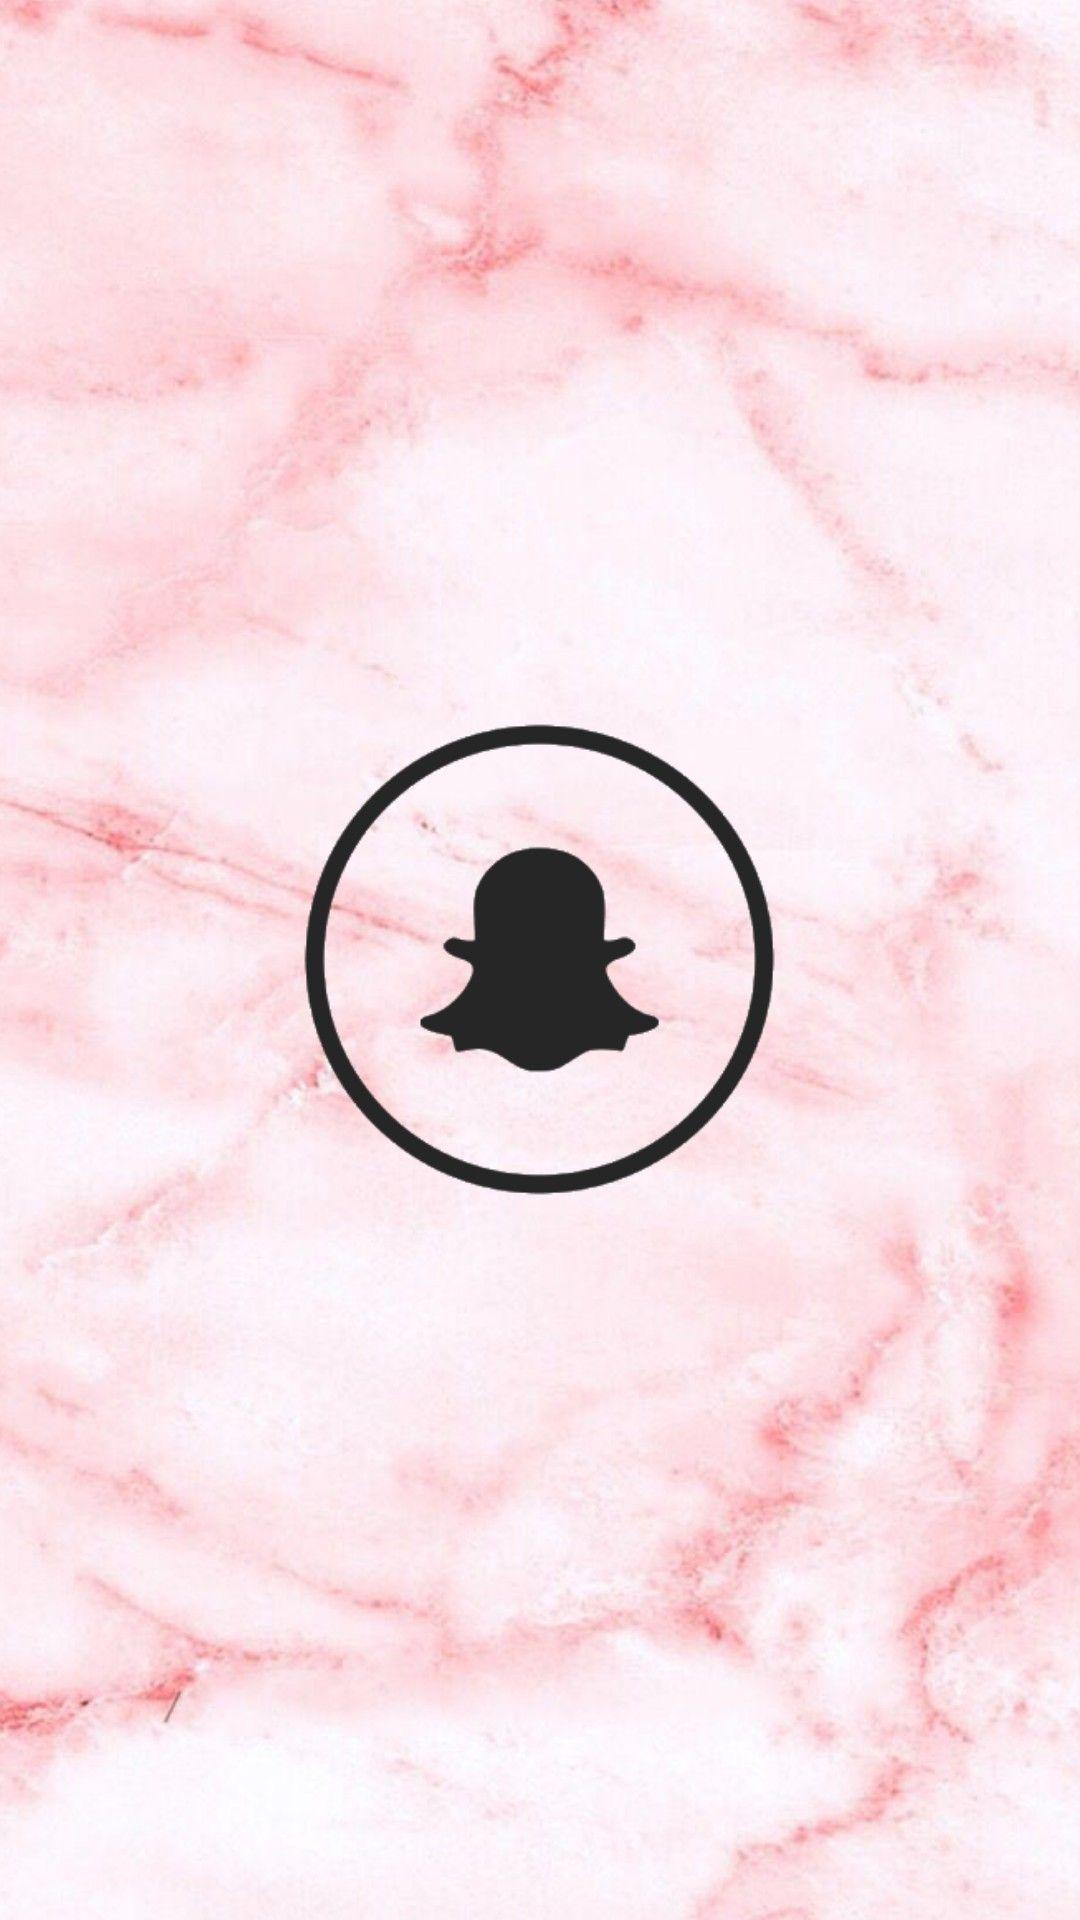 Tiktok Icon Pink Aesthetic Hot Tiktok 2020 # search for pink icons: tiktok icon pink aesthetic hot tiktok